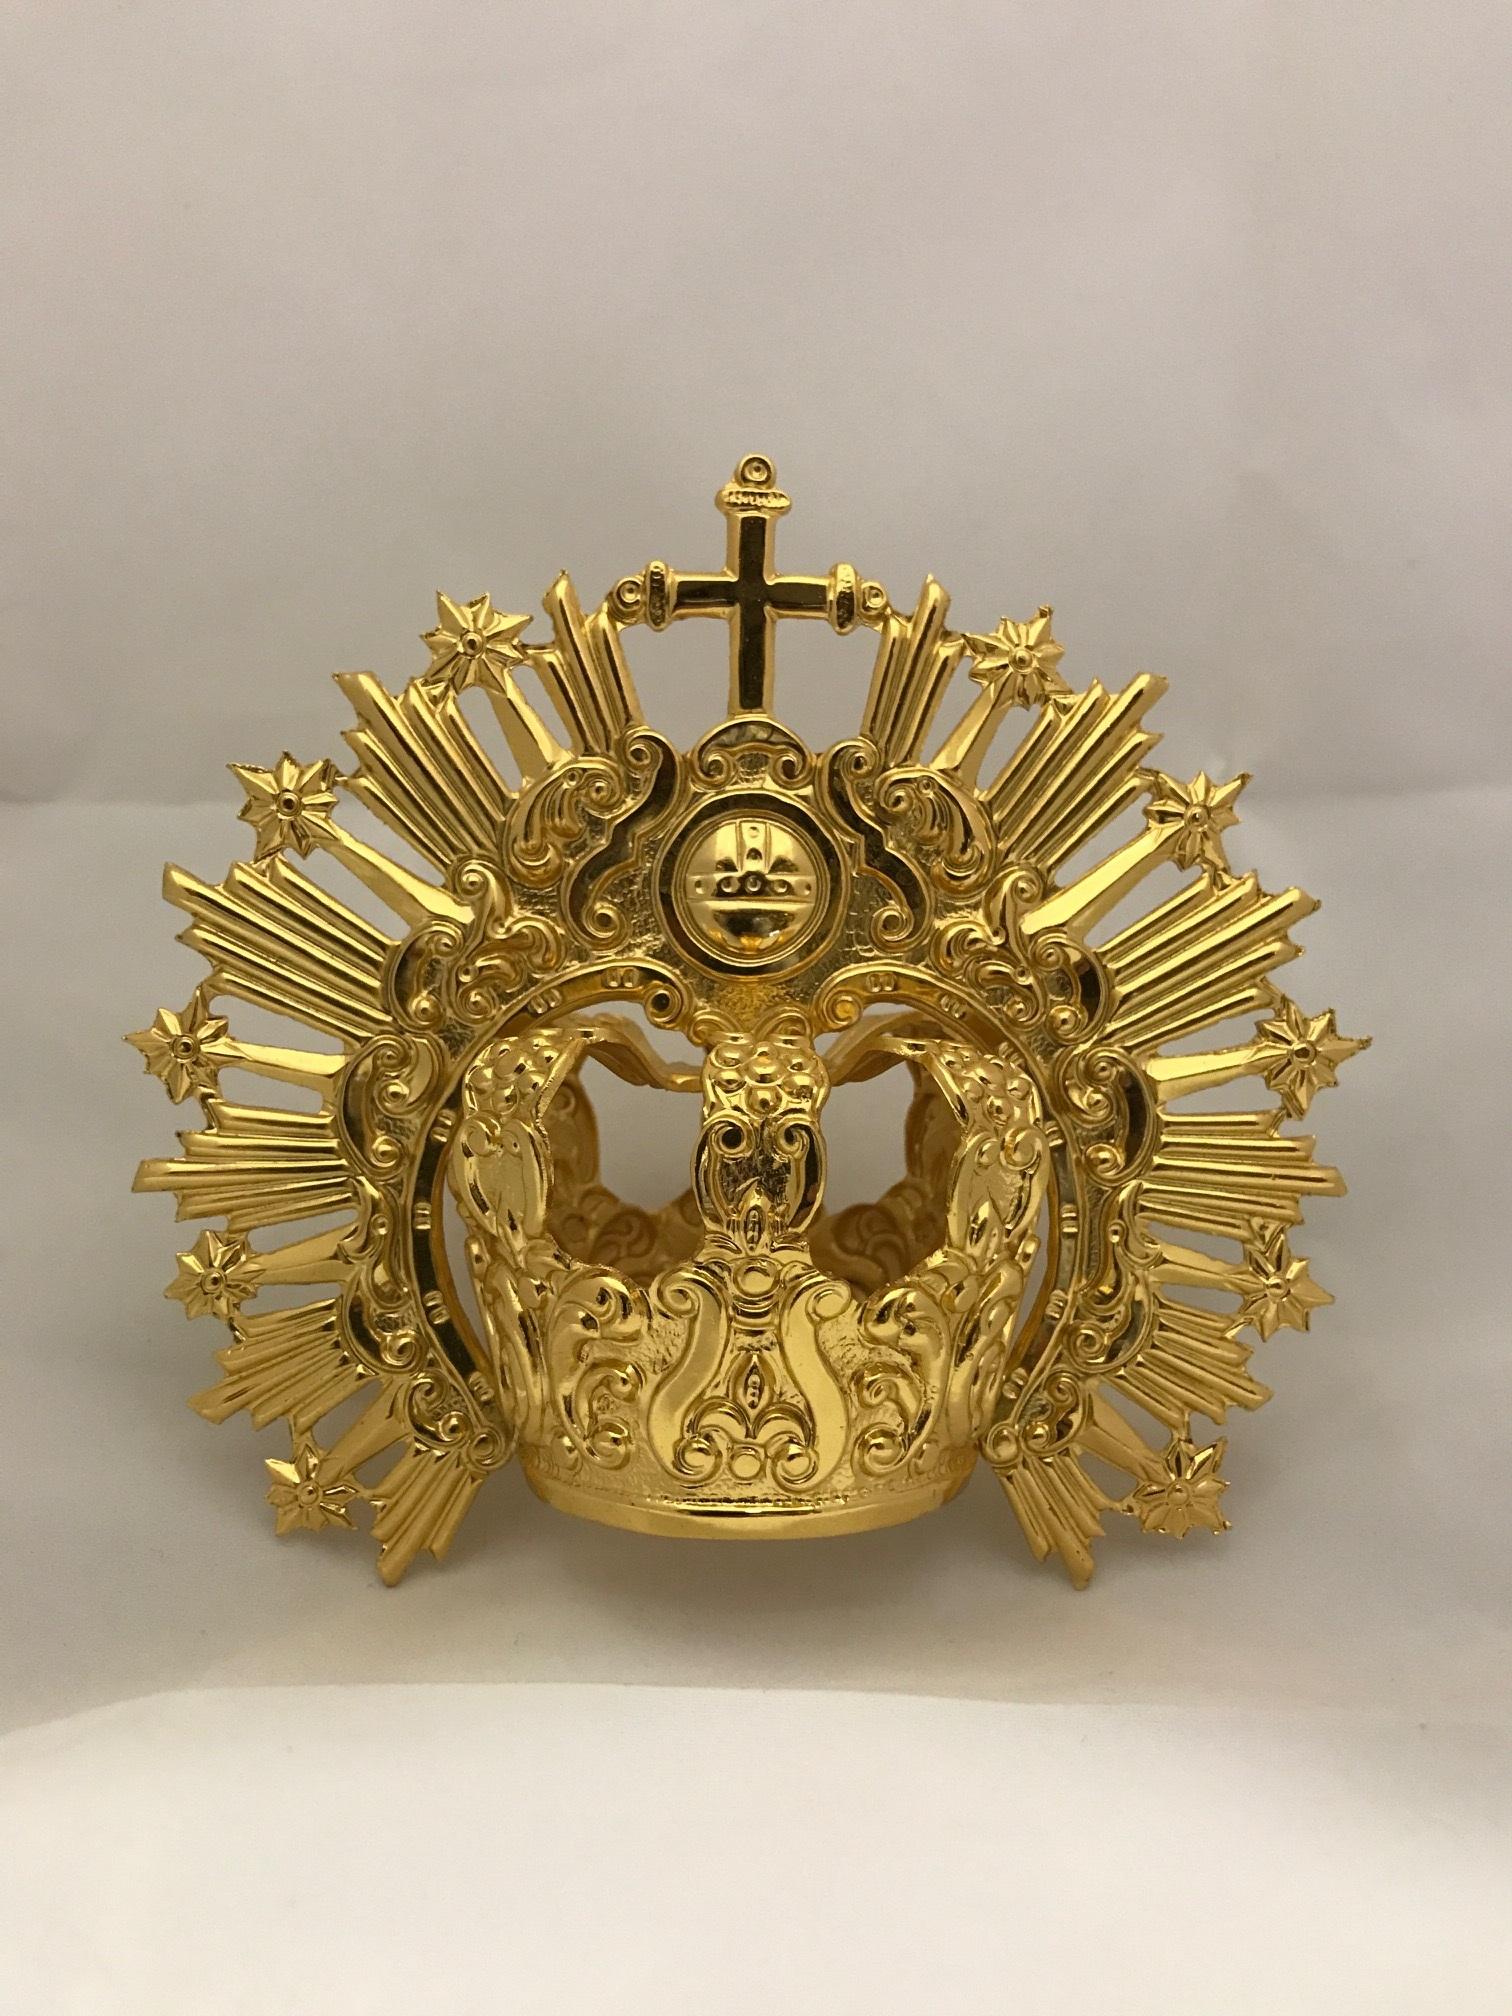 Corona imperial cincelada